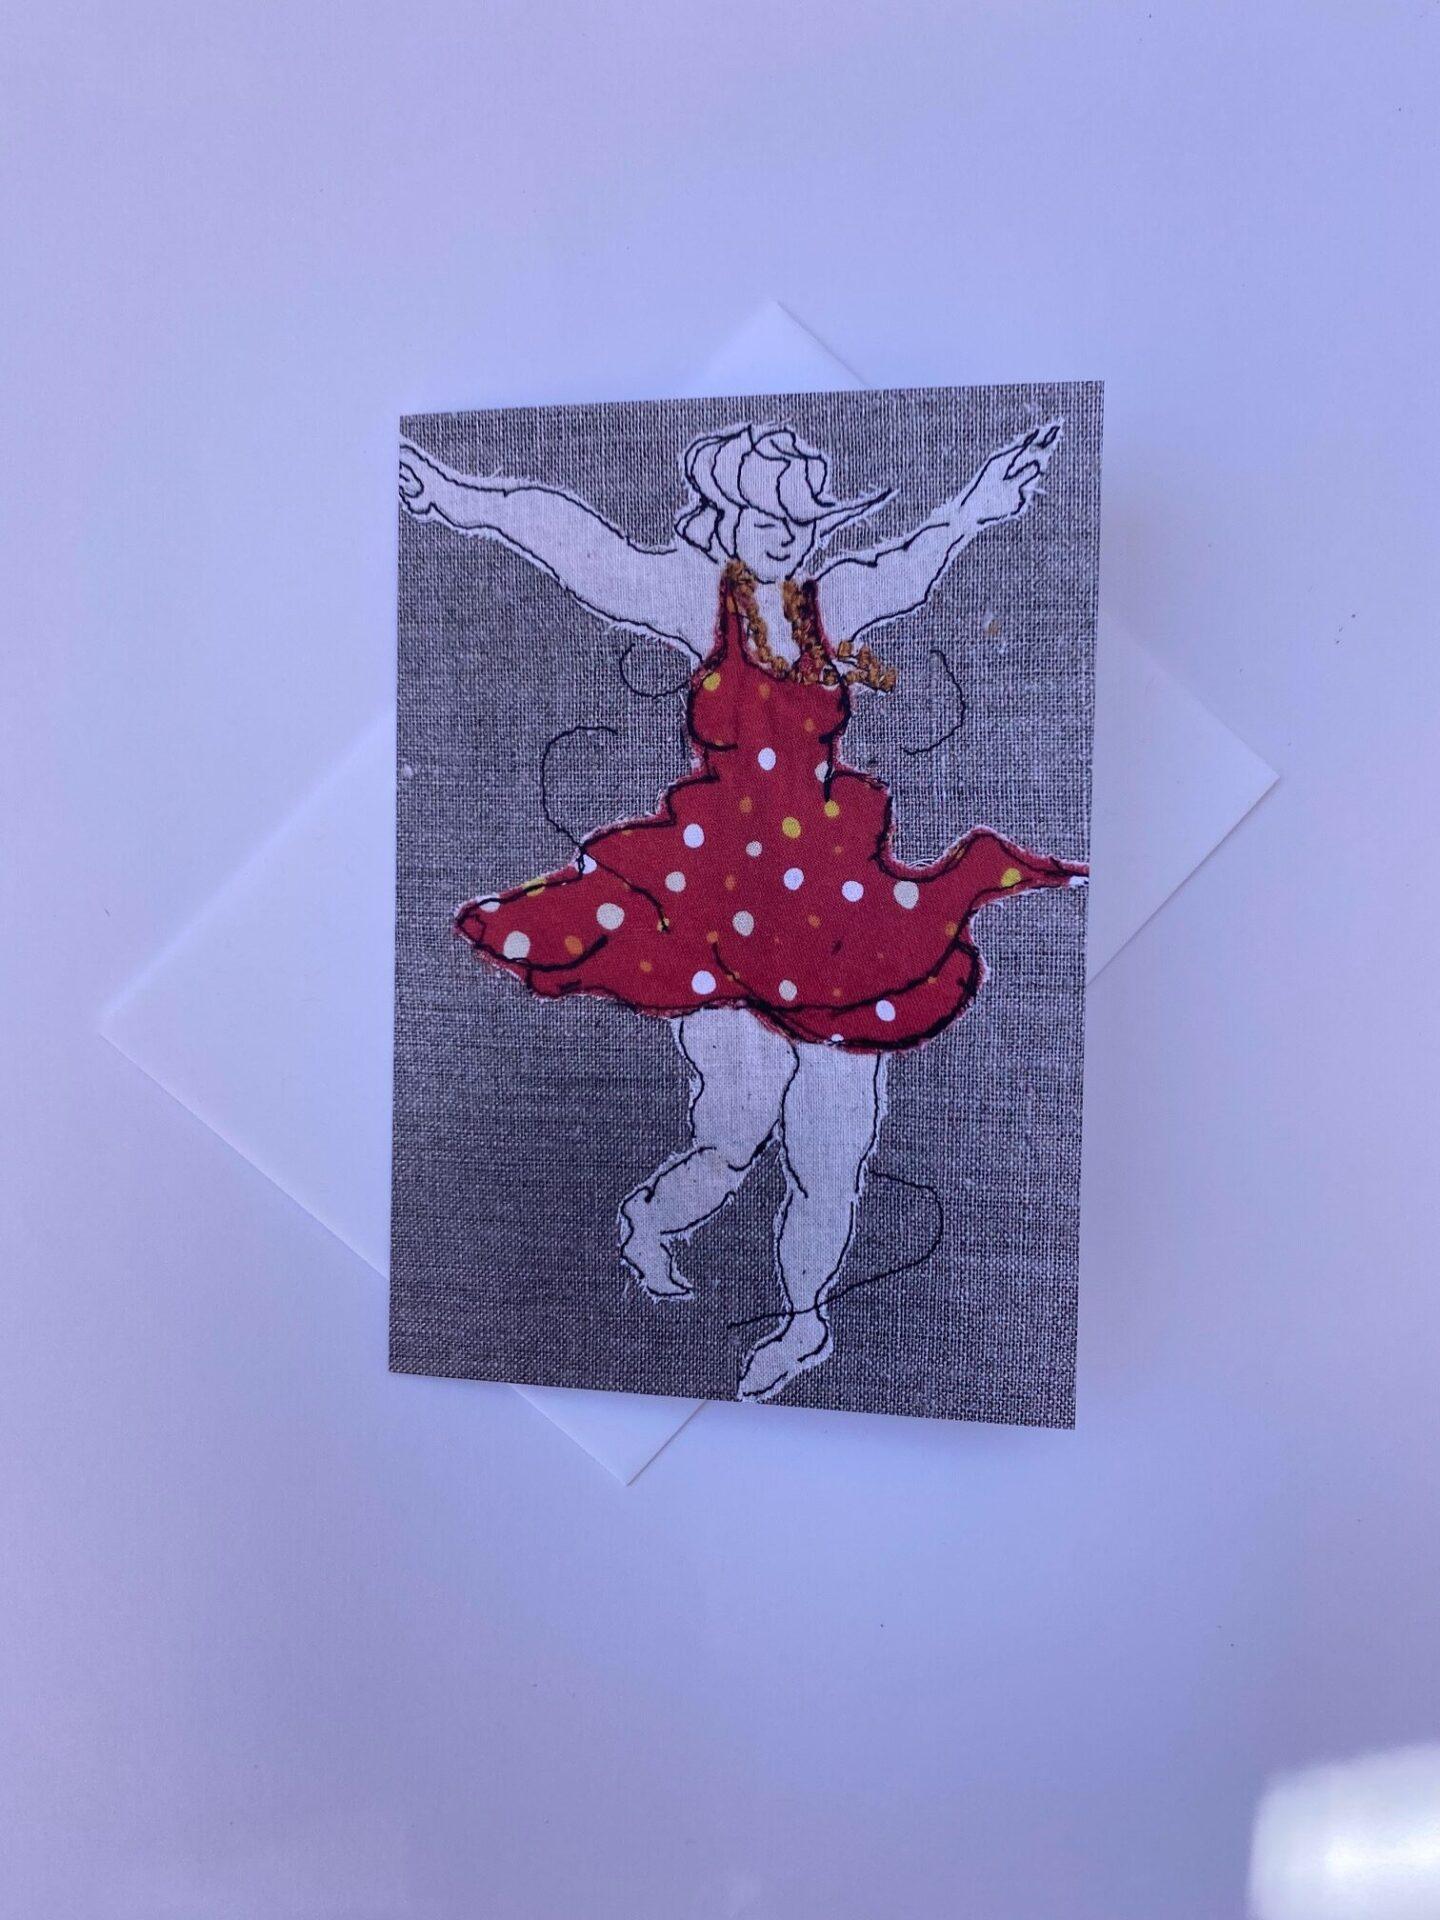 card-dancing-queen-polka-dot-by-juliet-d-collins-by-julietdcollins